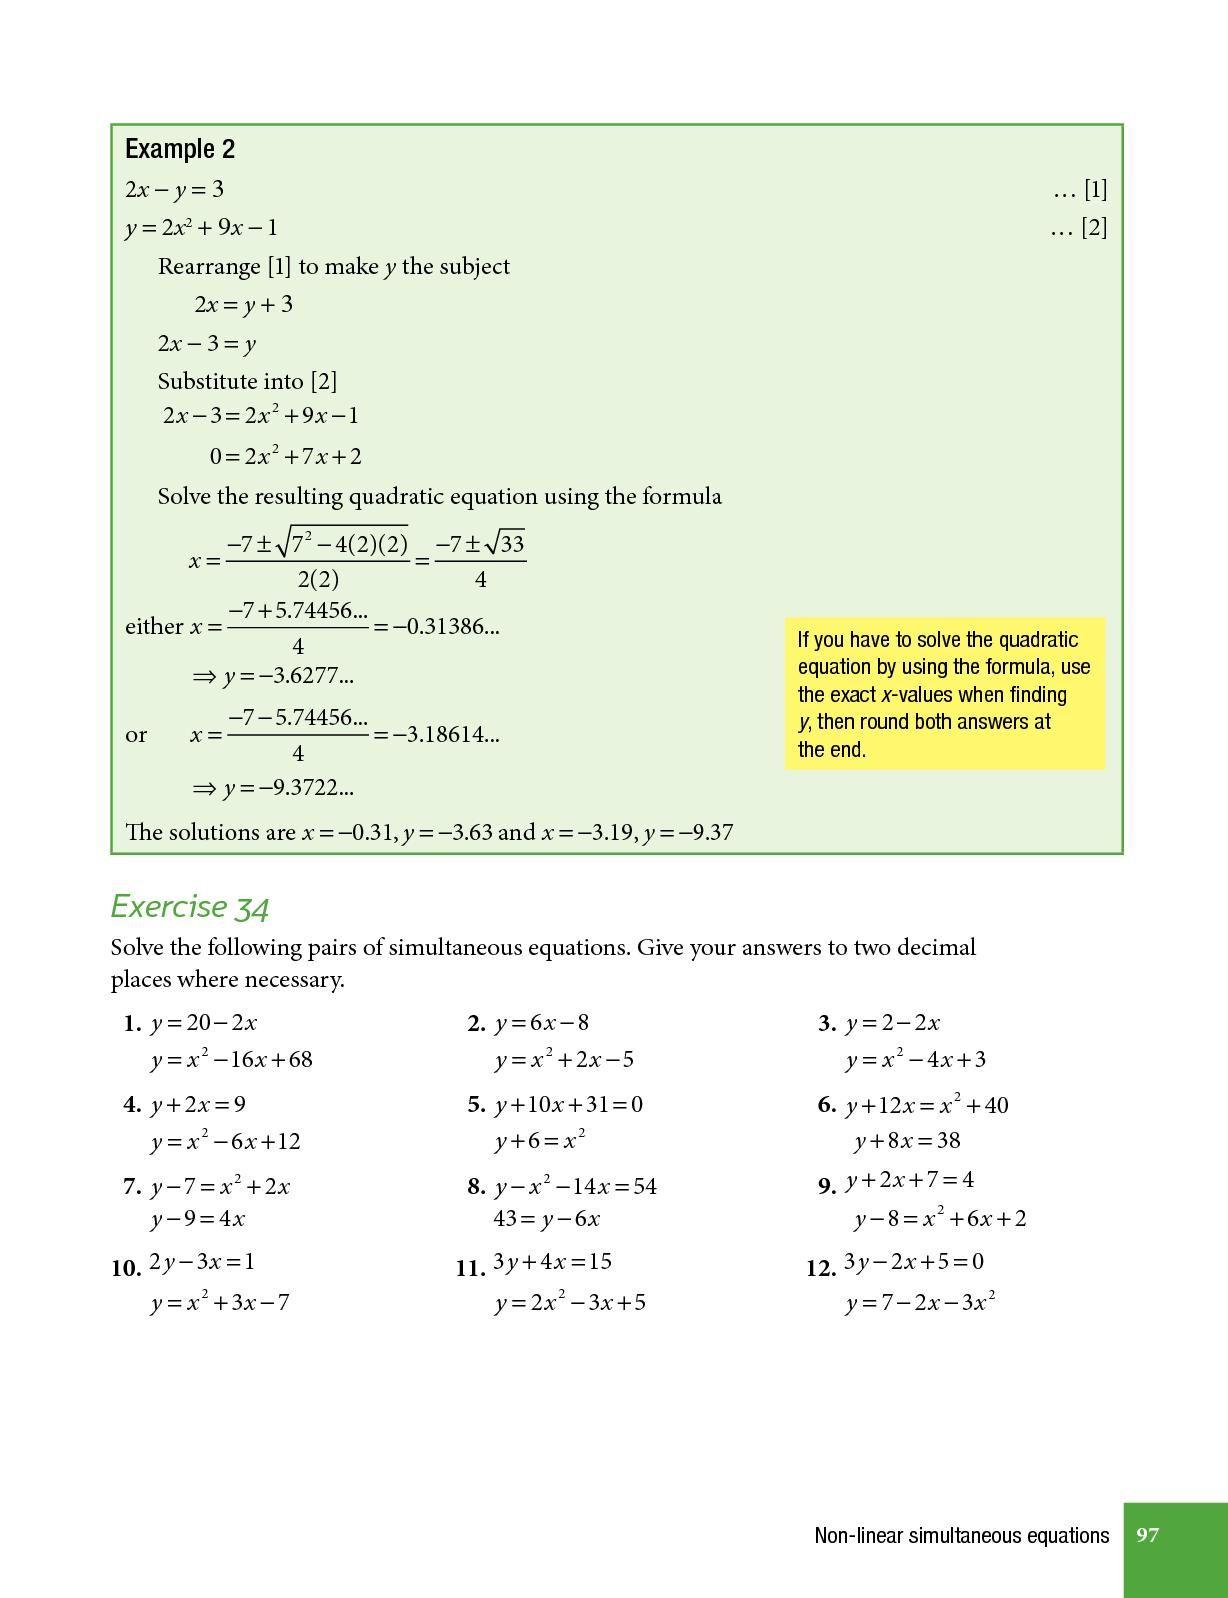 Pdf Print Complete Mathematics For Cambridge Igcse Fifth Edition Extended Cambridge Igcse Mathematics Quadratics